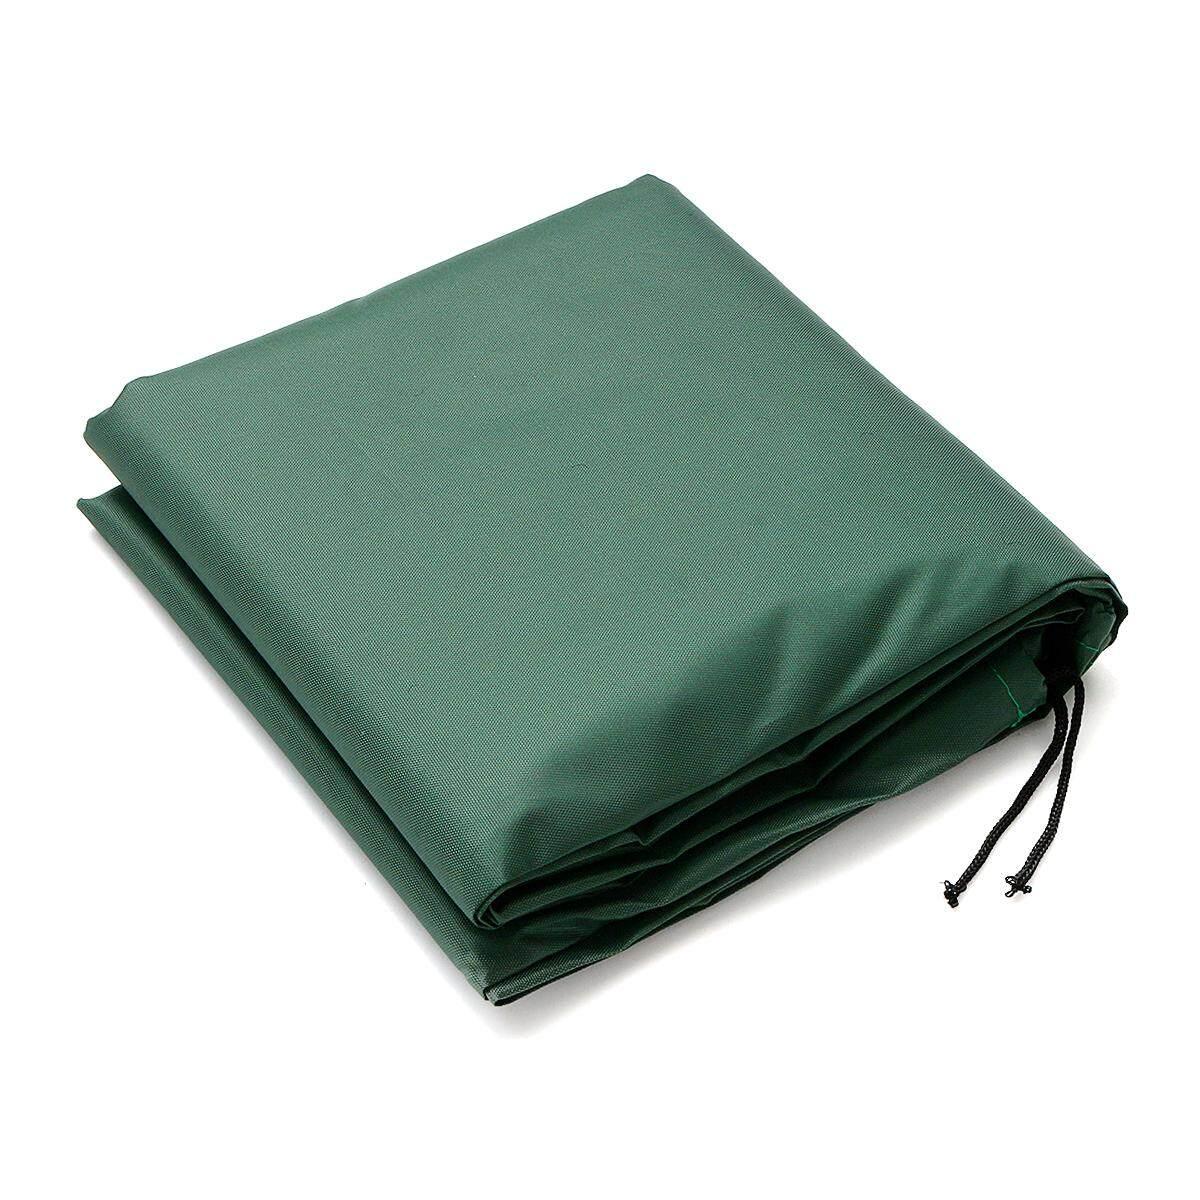 68x68cm Waterproof Outdoor Patio Garden Furniture Rain Snow Cover Table Chair